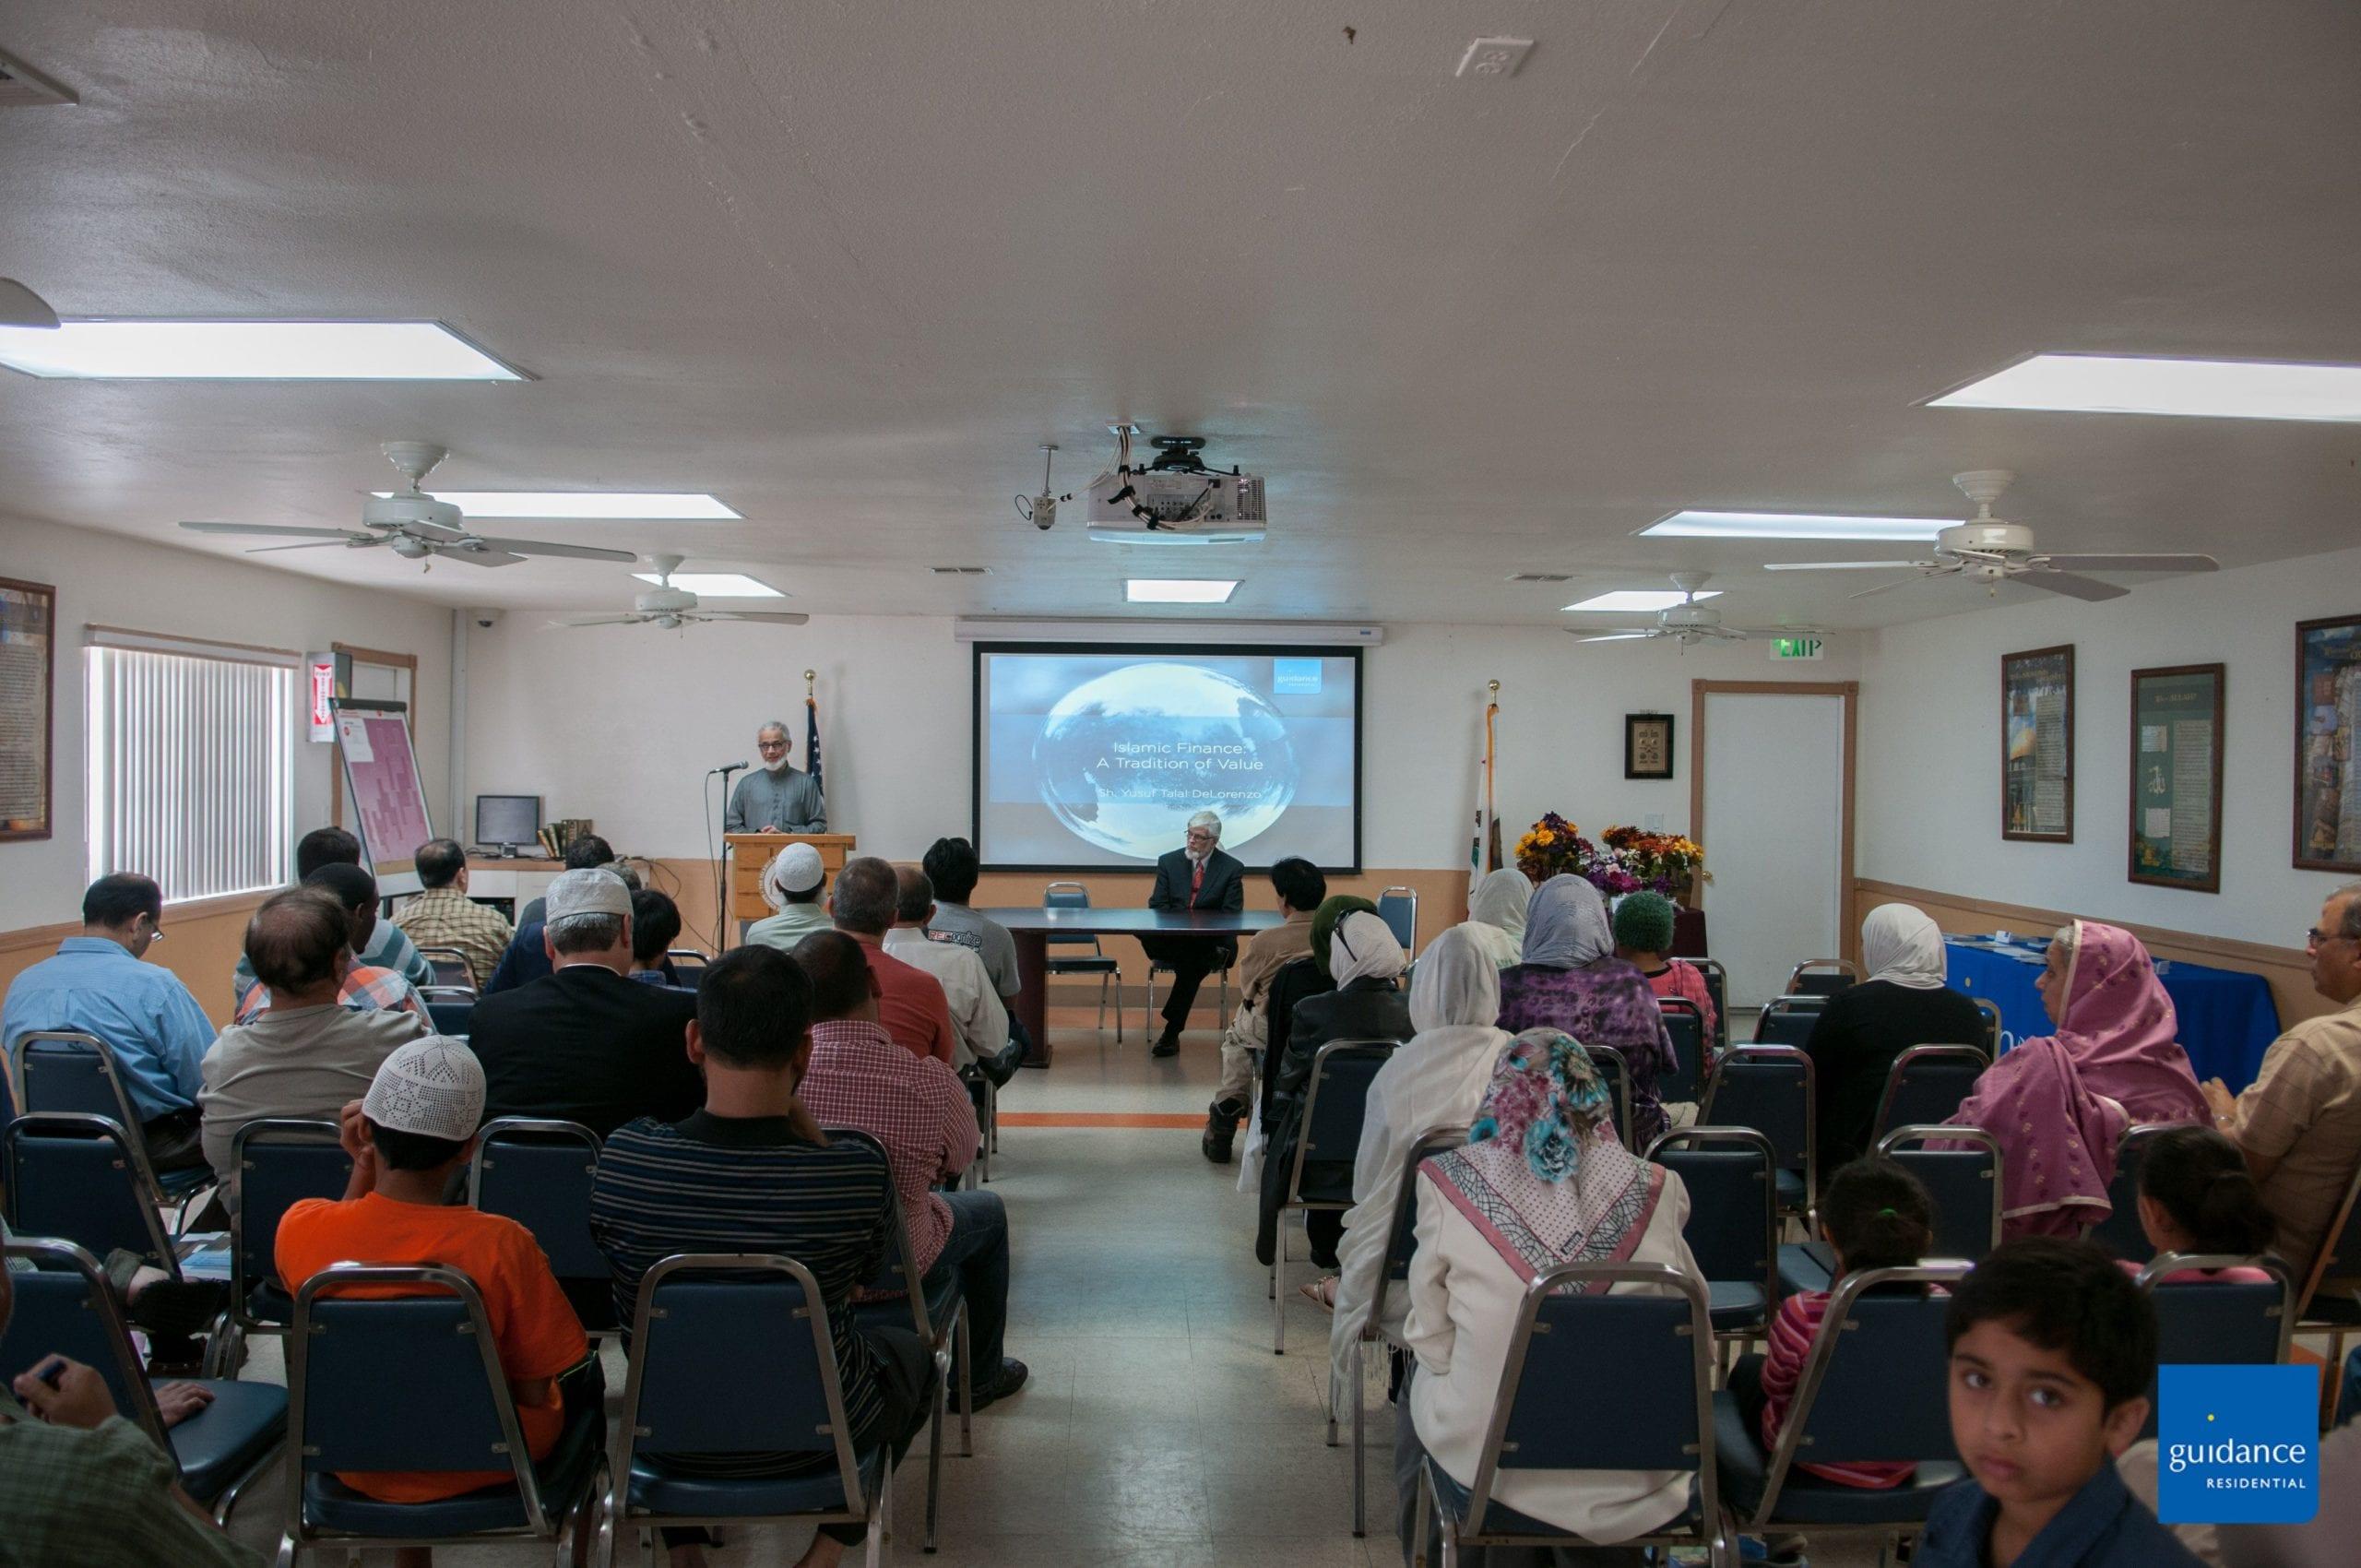 Shaykh Yusuf DeLorenzo - California - Guidance Residential 5